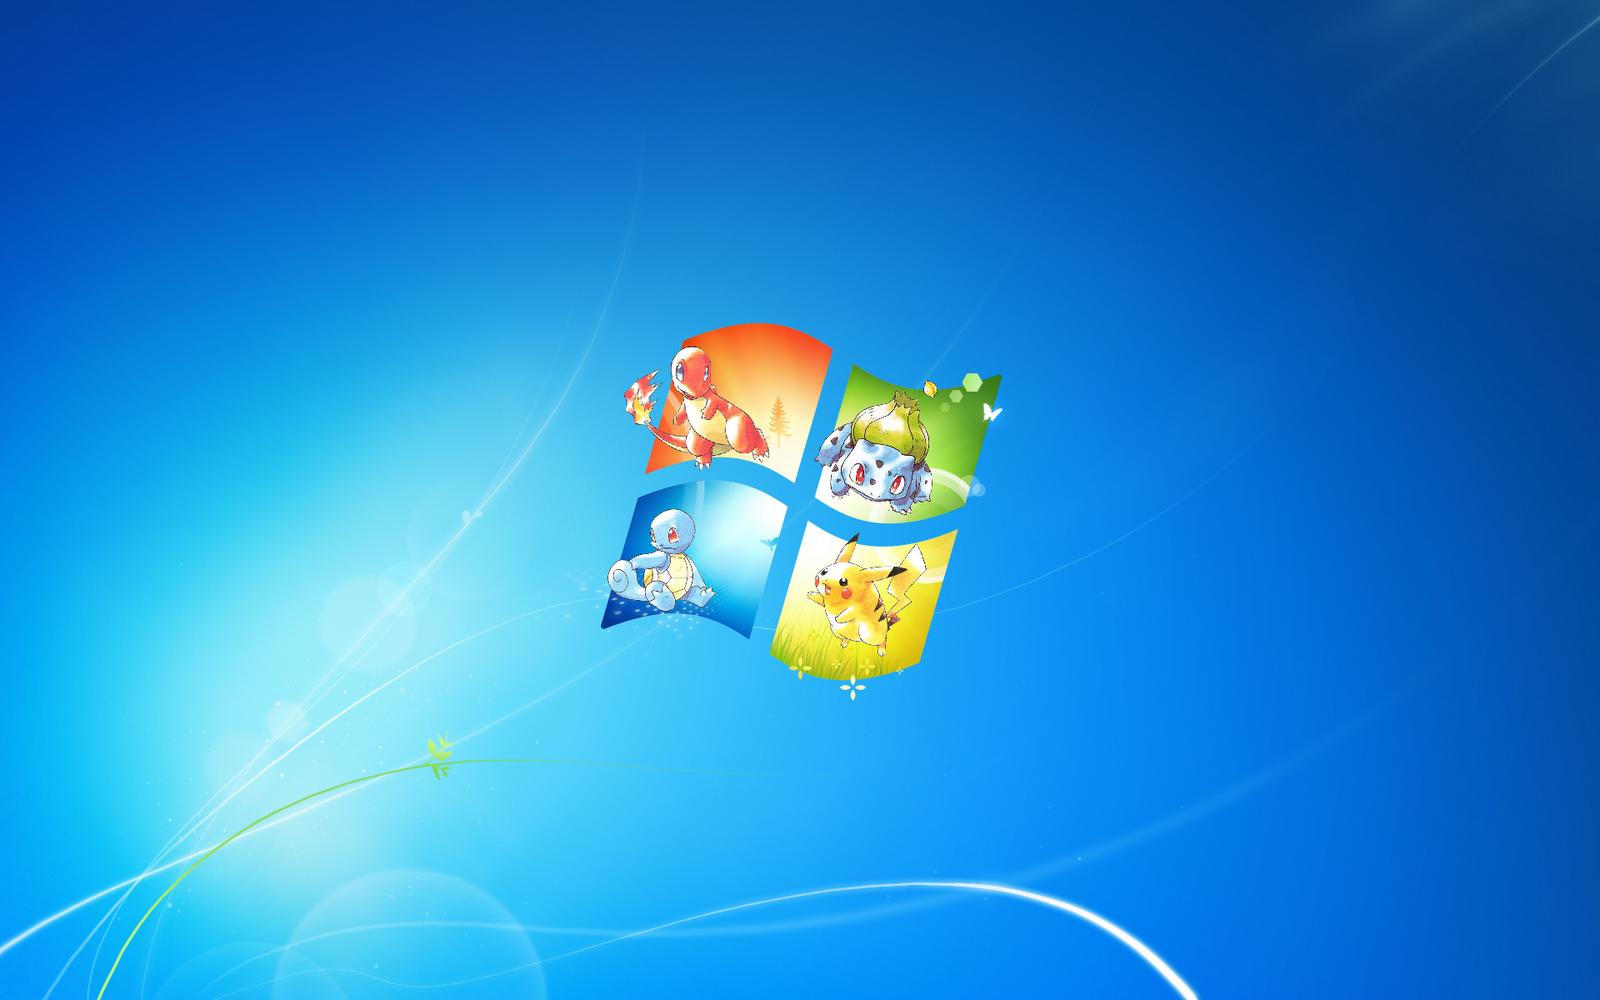 49 Wallpapers For Desktop Pokemon On Wallpapersafari